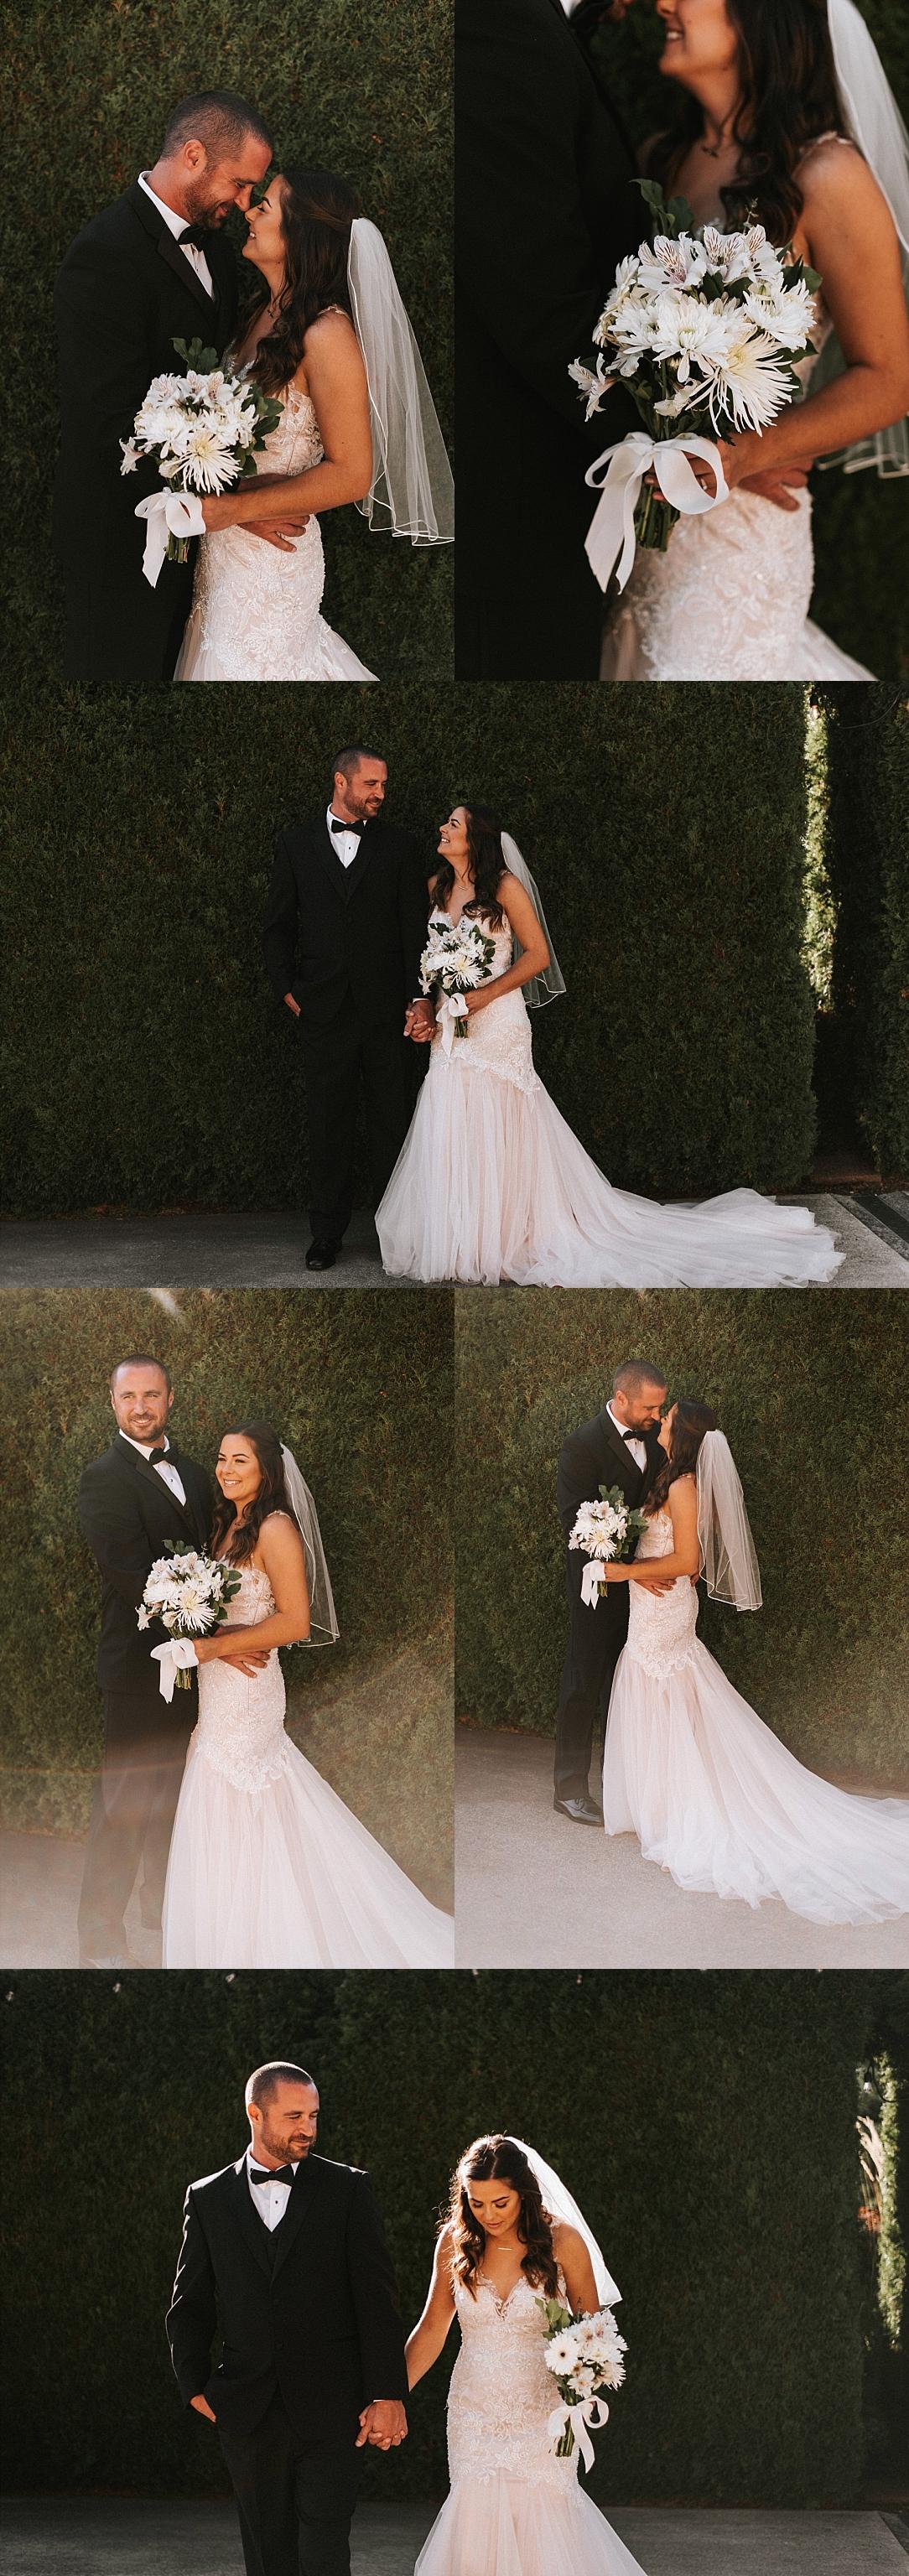 romantic backyard wedding_0023.jpg